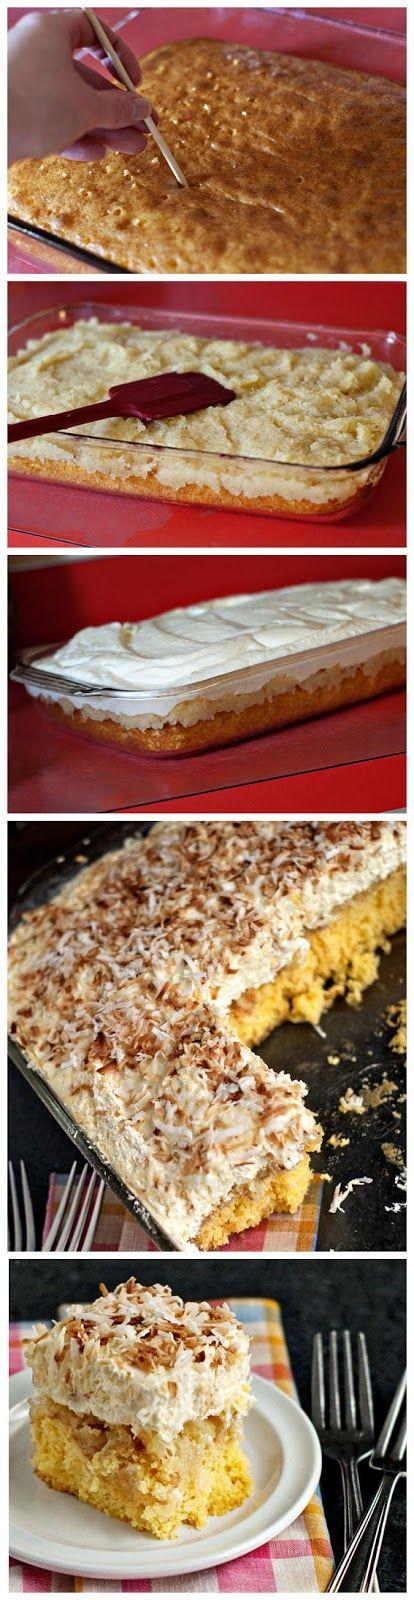 Best 25 Hawaiian wedding cakes ideas on Pinterest Hawaiian